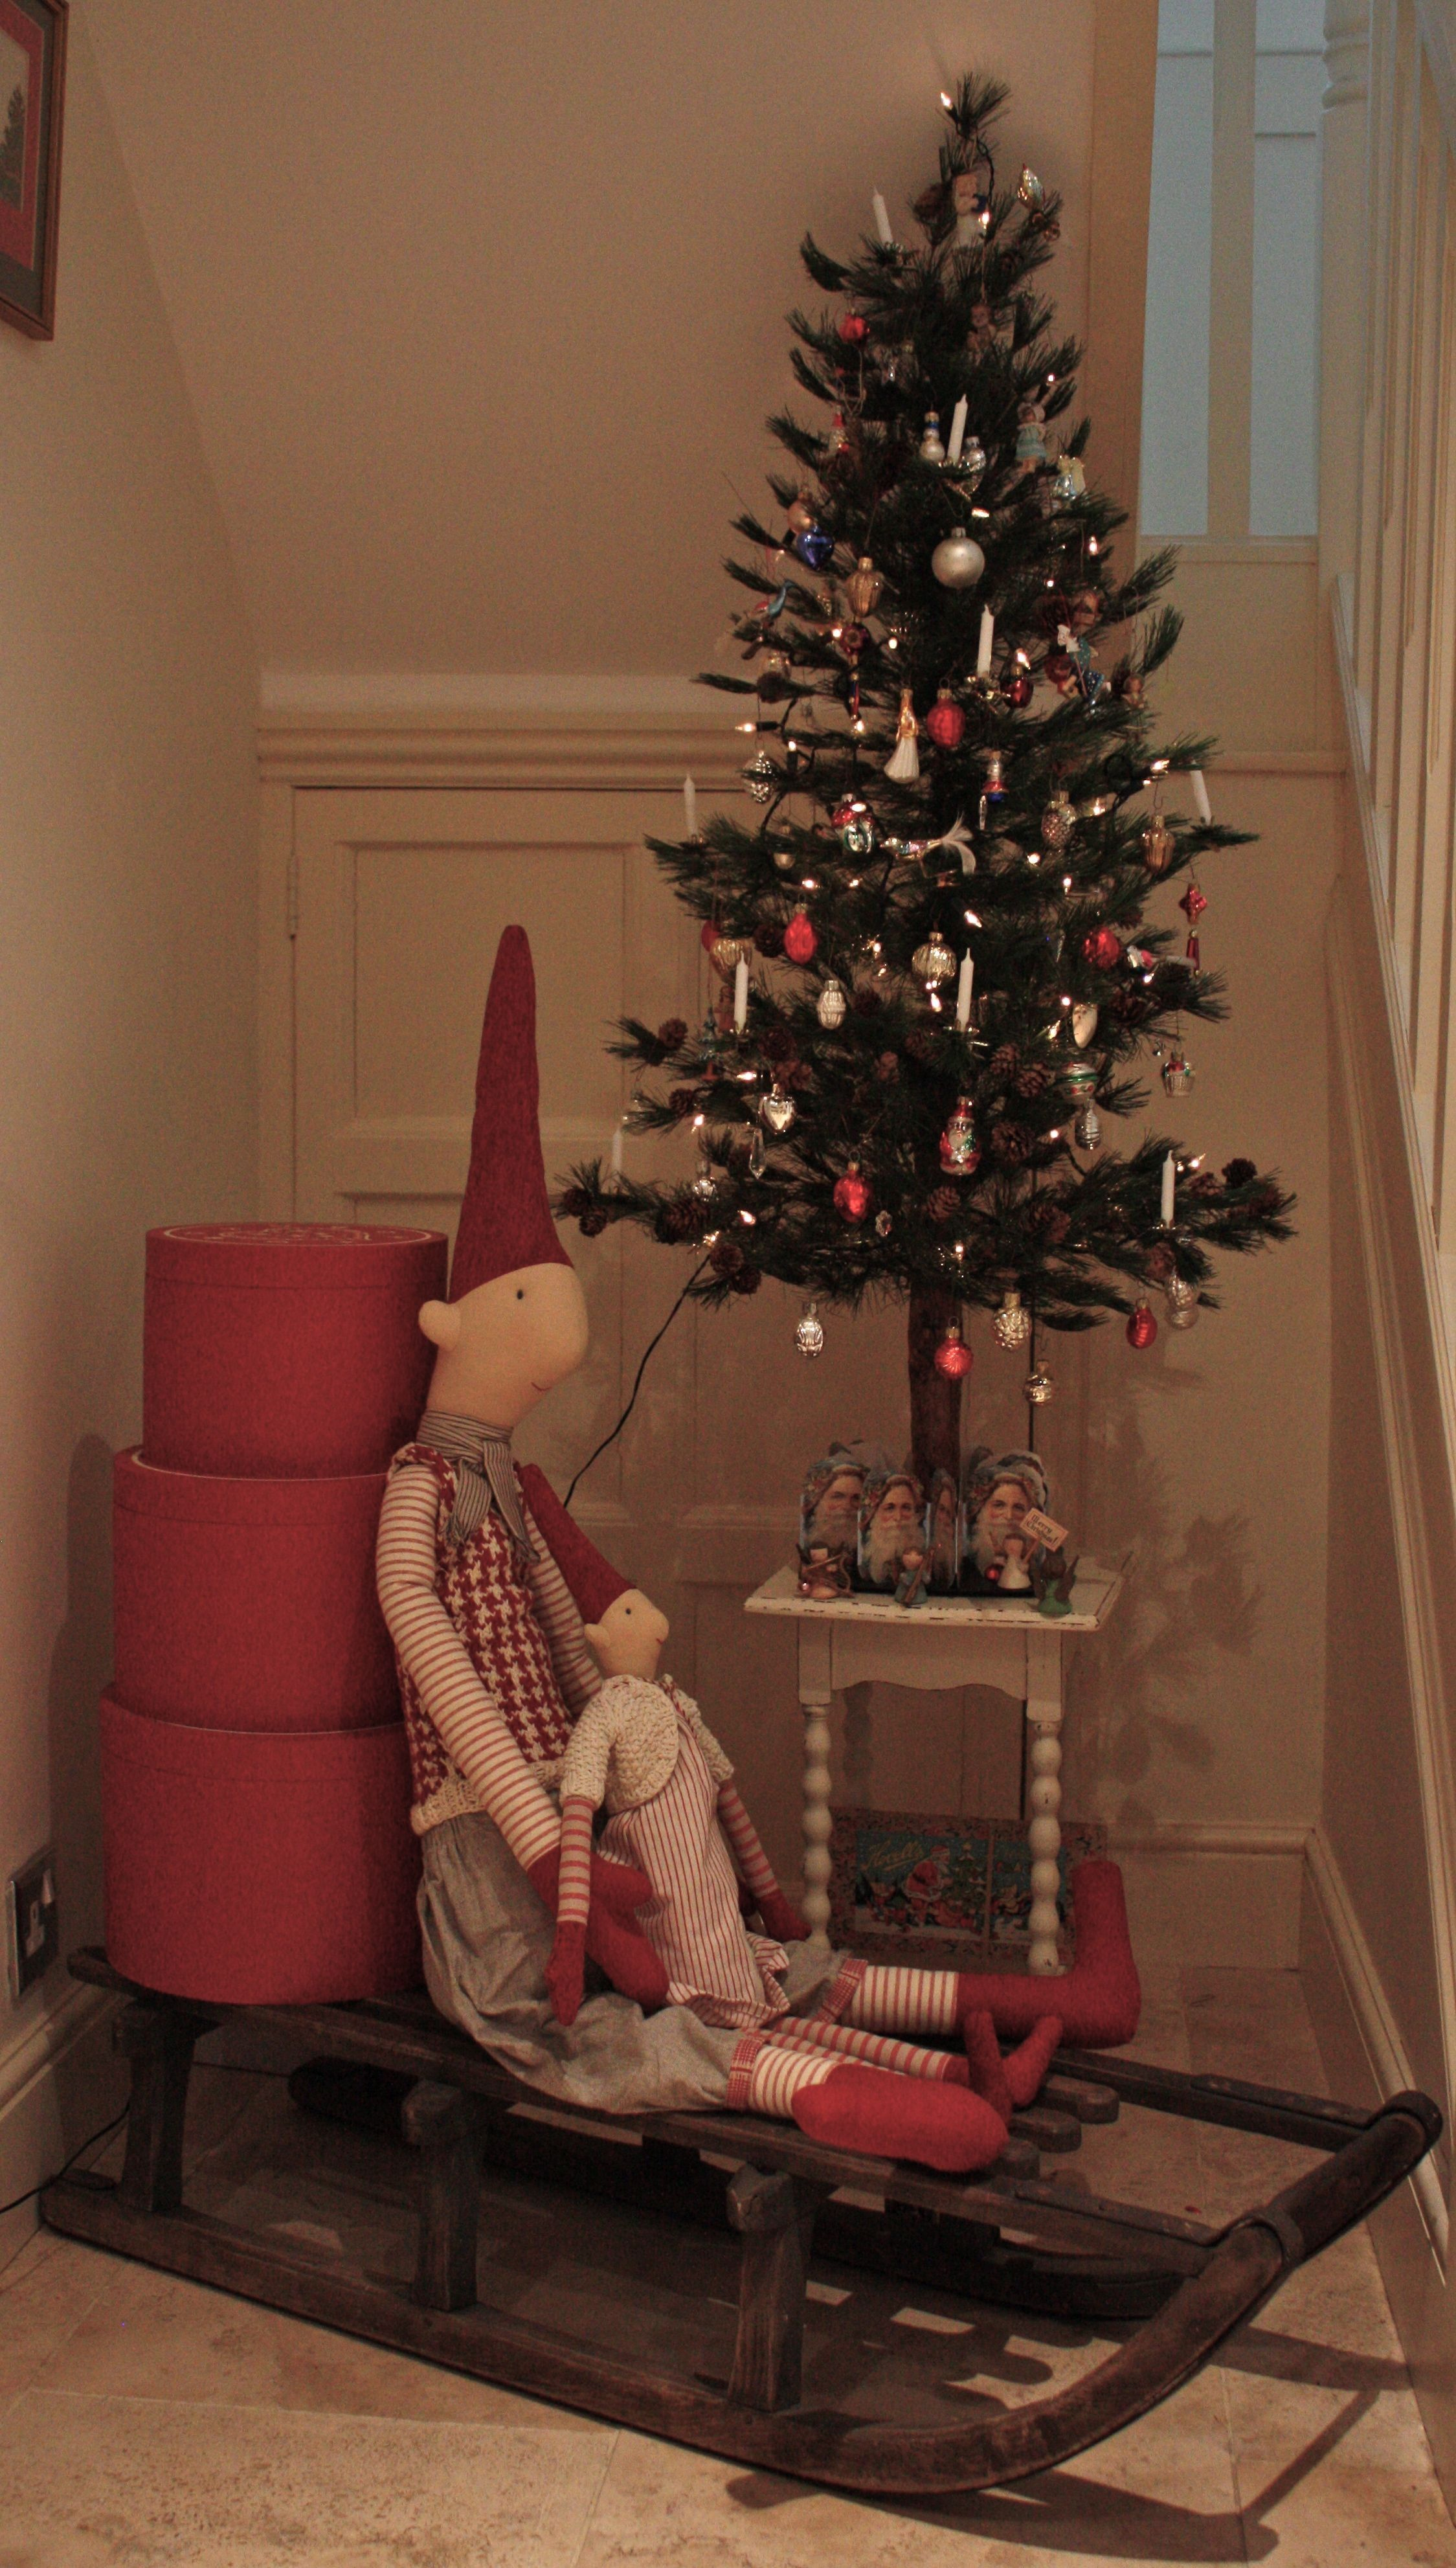 harrods christmas tree